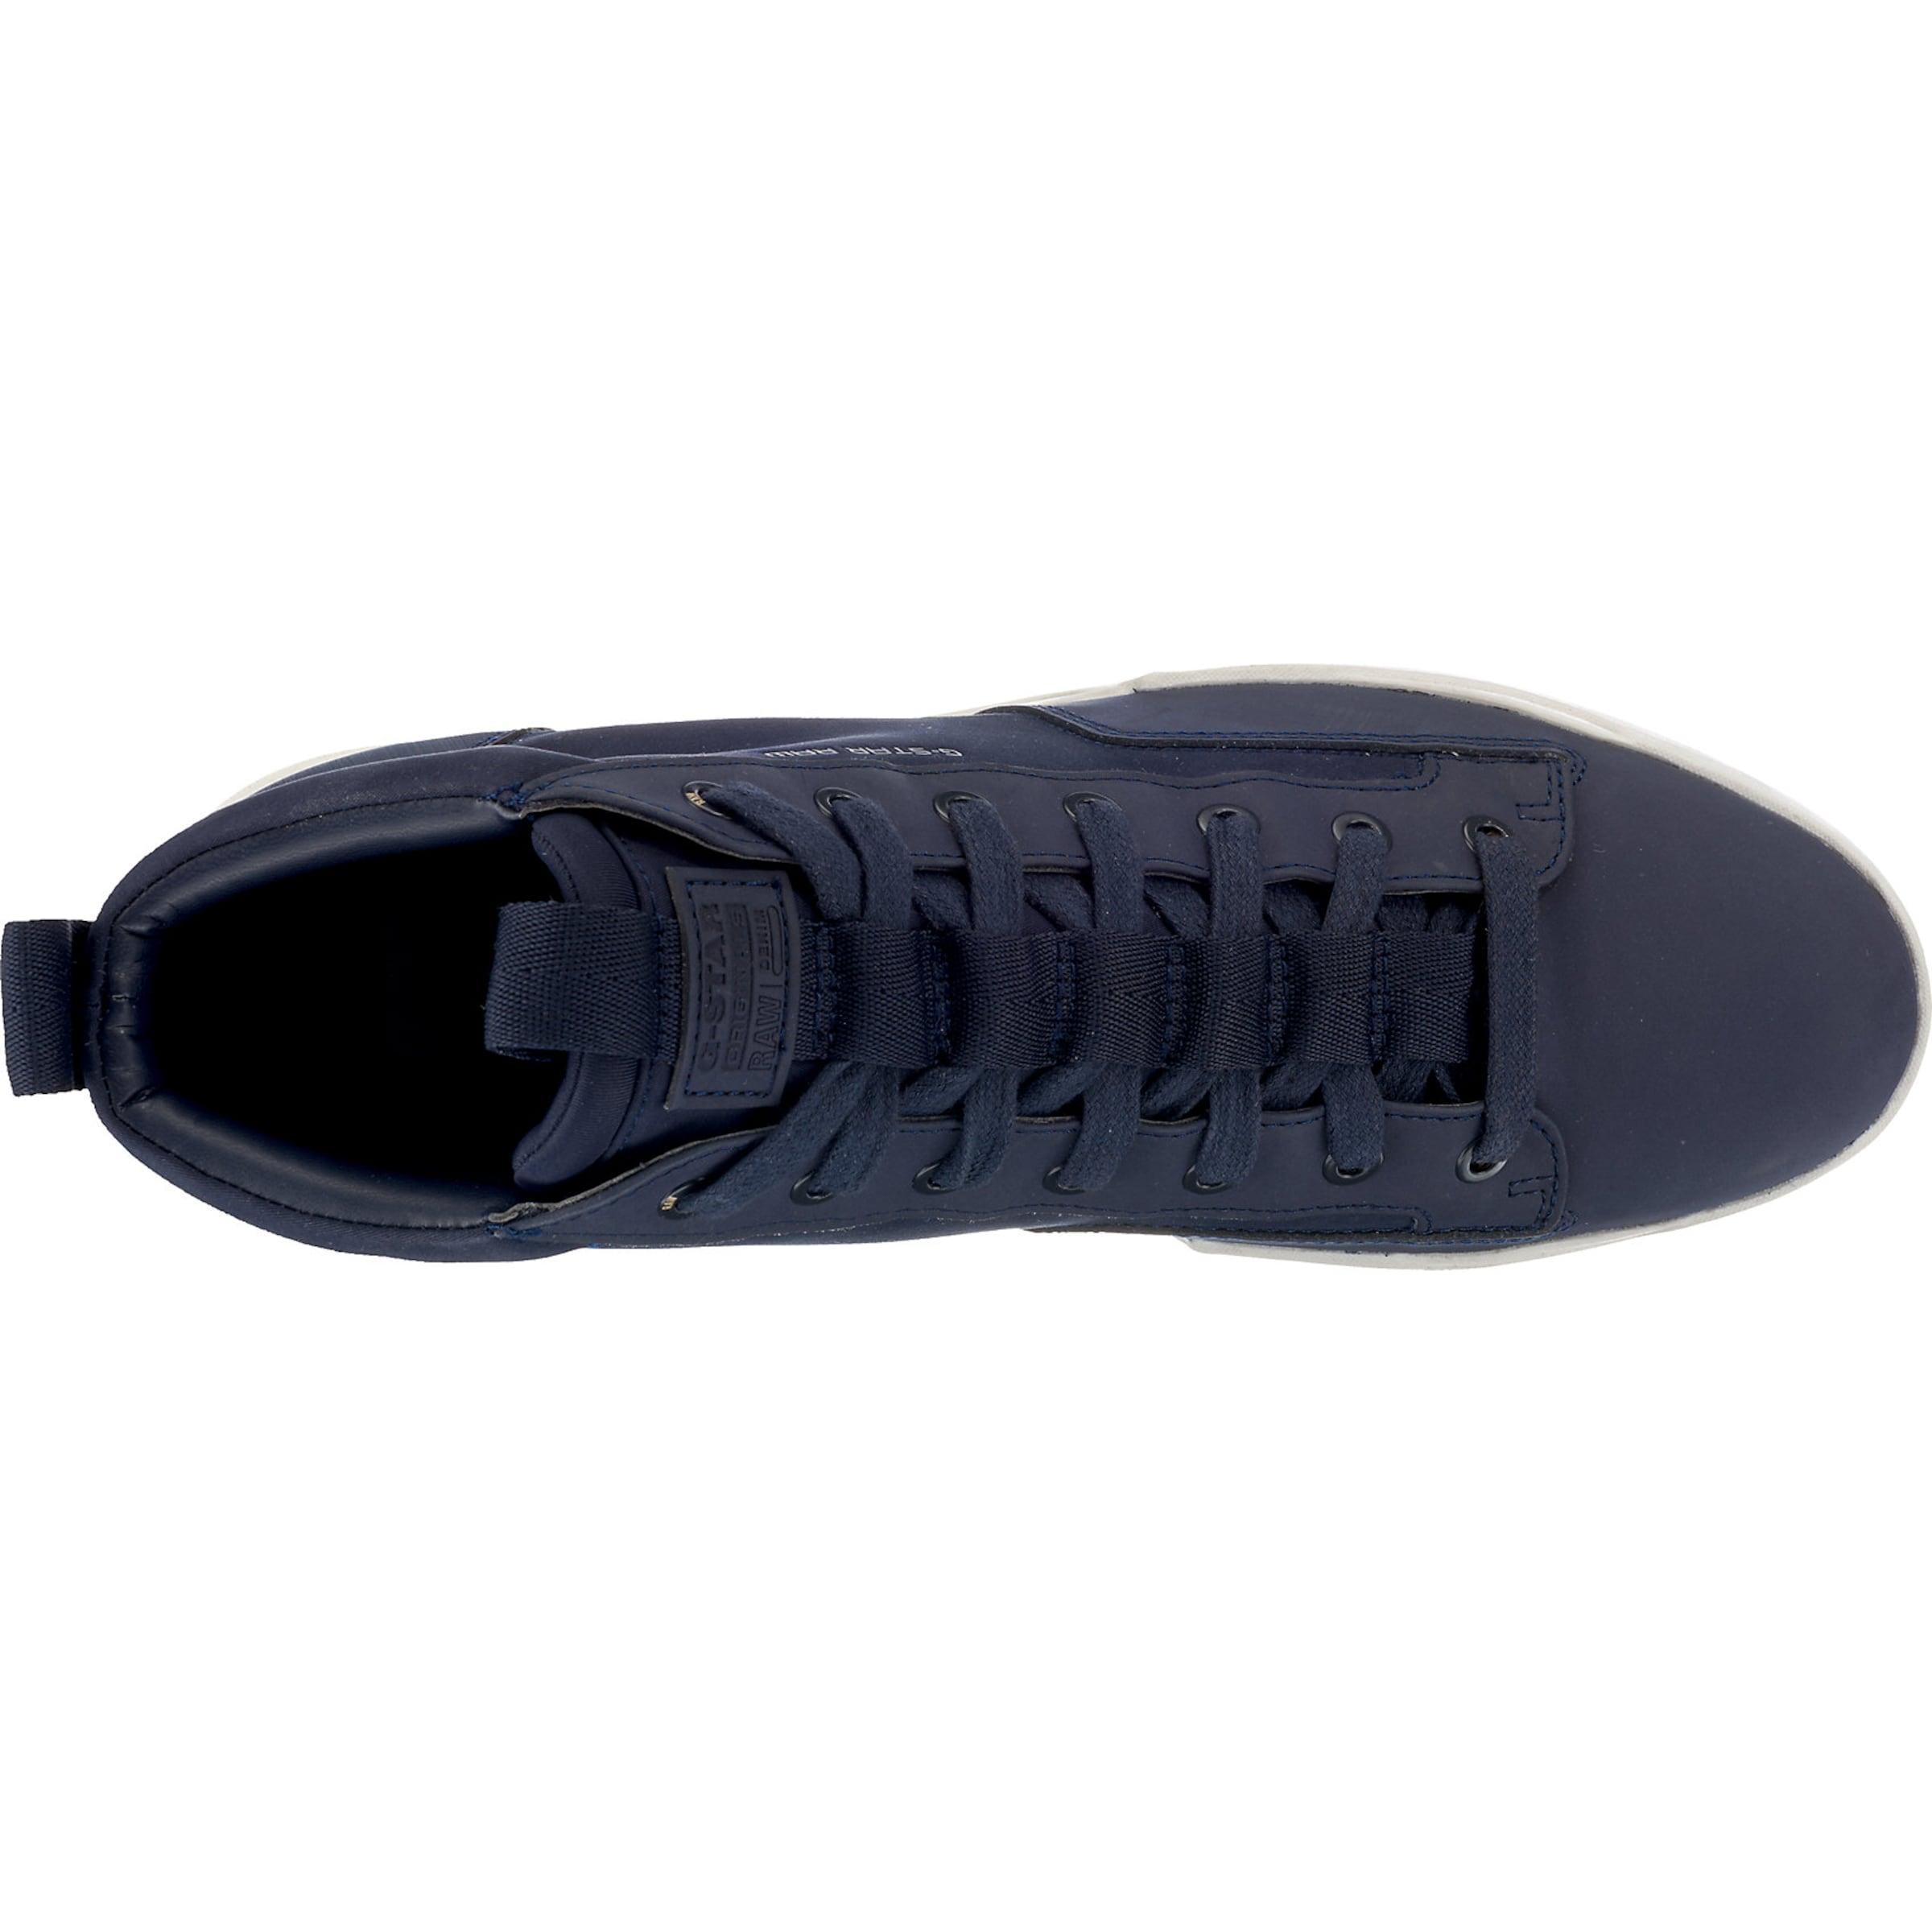 star In Sneaker Raw G 'rackam MarineWeiß Core' 1Julc5TFK3